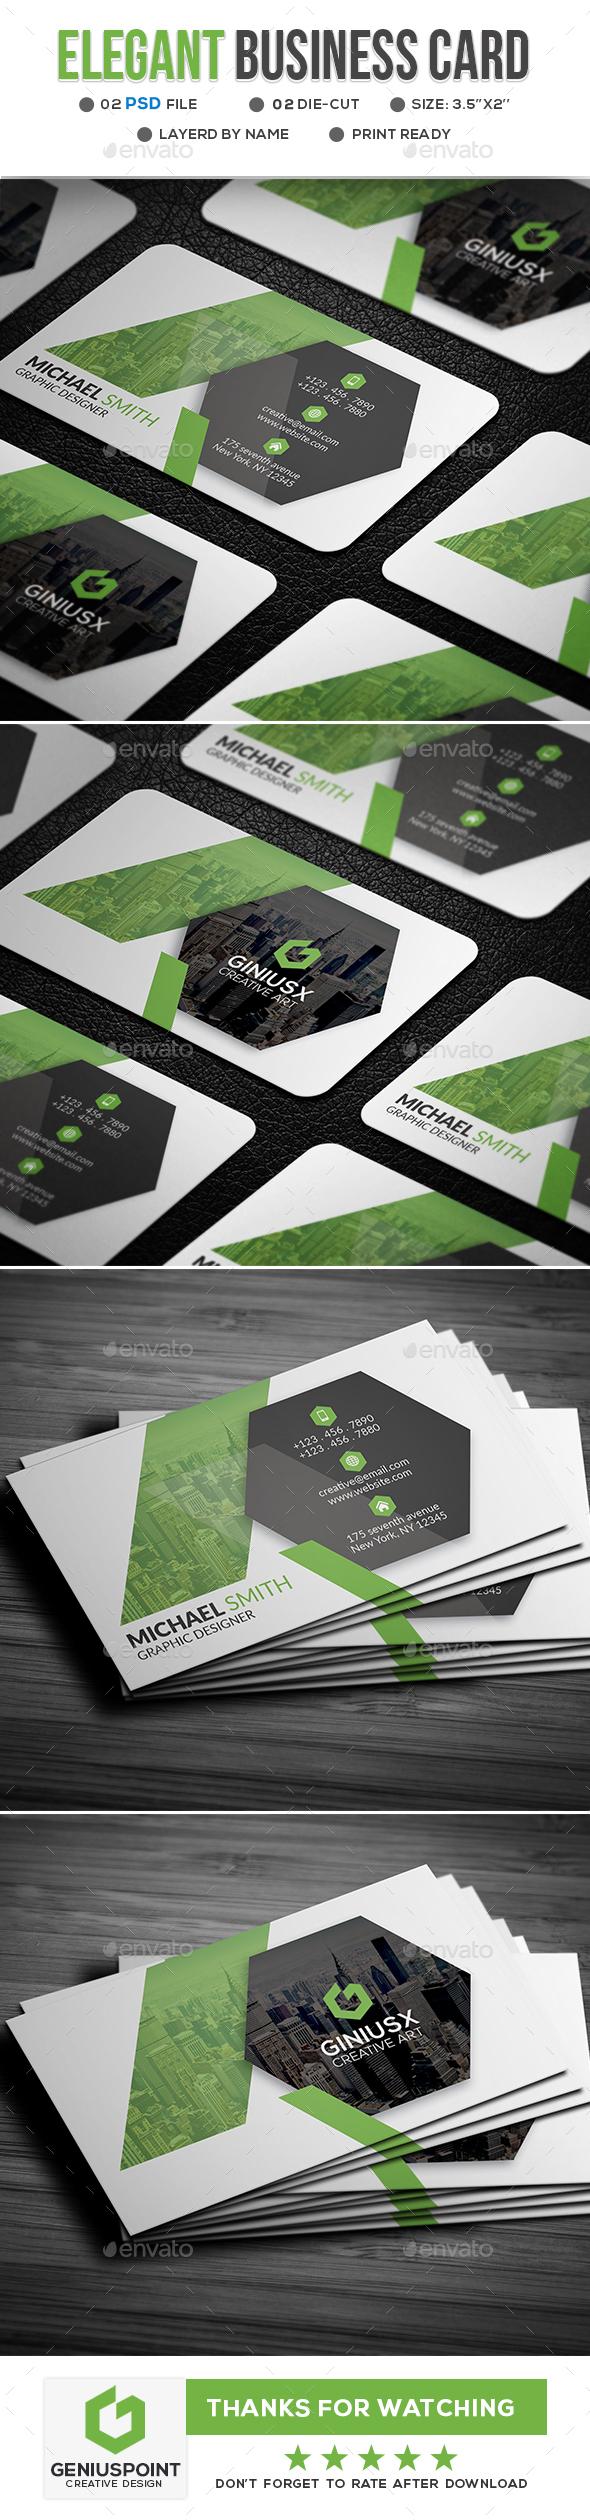 Elegant Business Card - Business Cards Print Templates